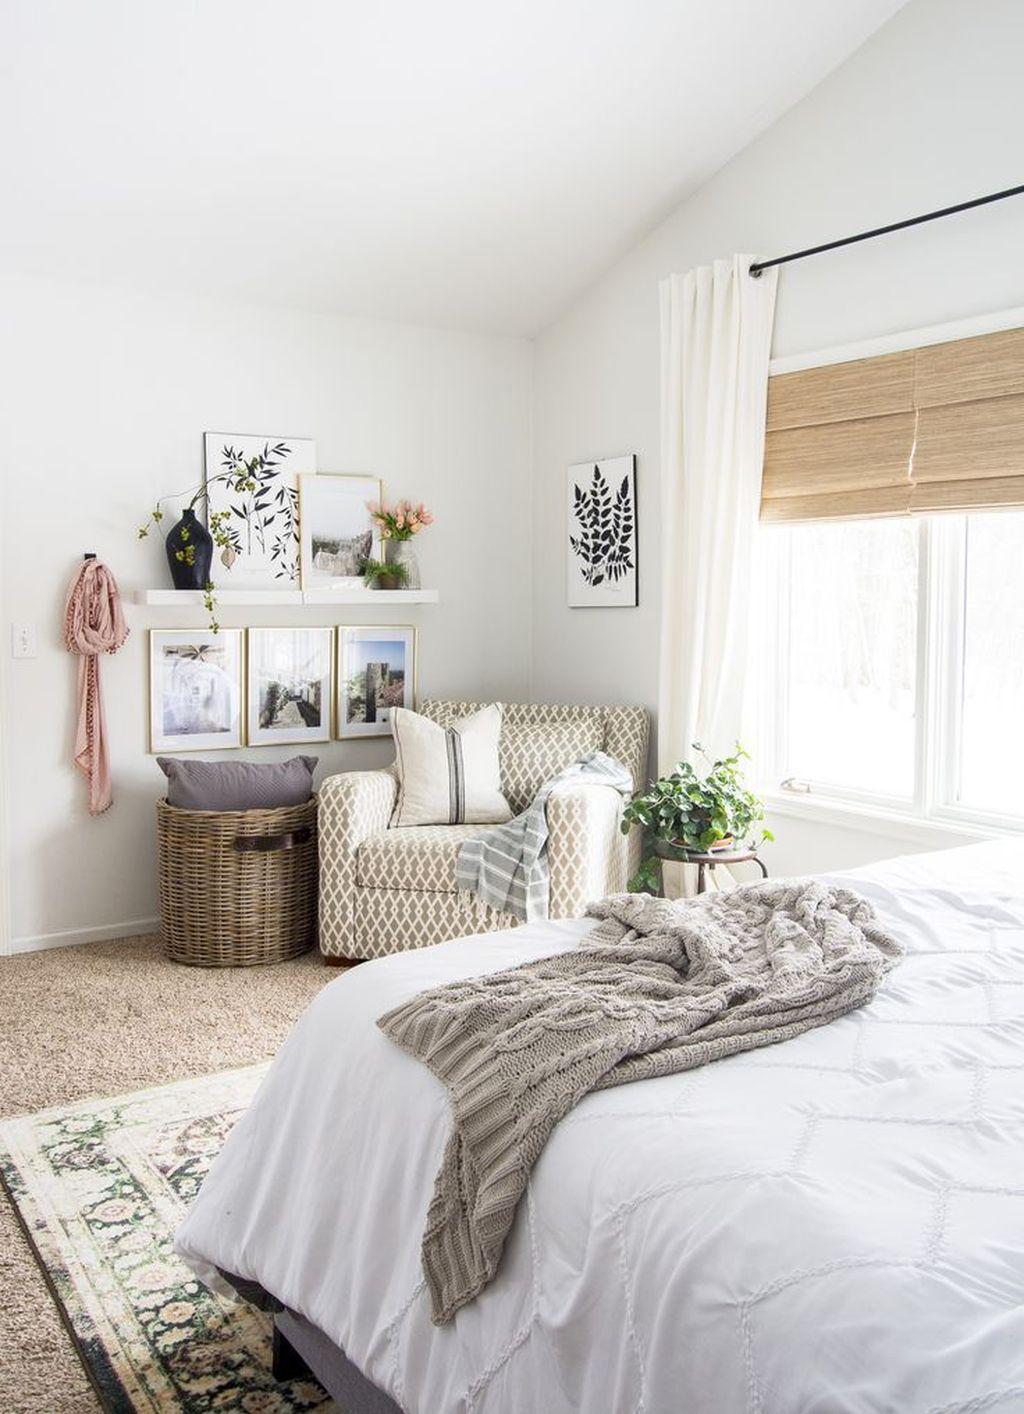 Lovely Spring Bedroom Decor Ideas Trending This Year 22